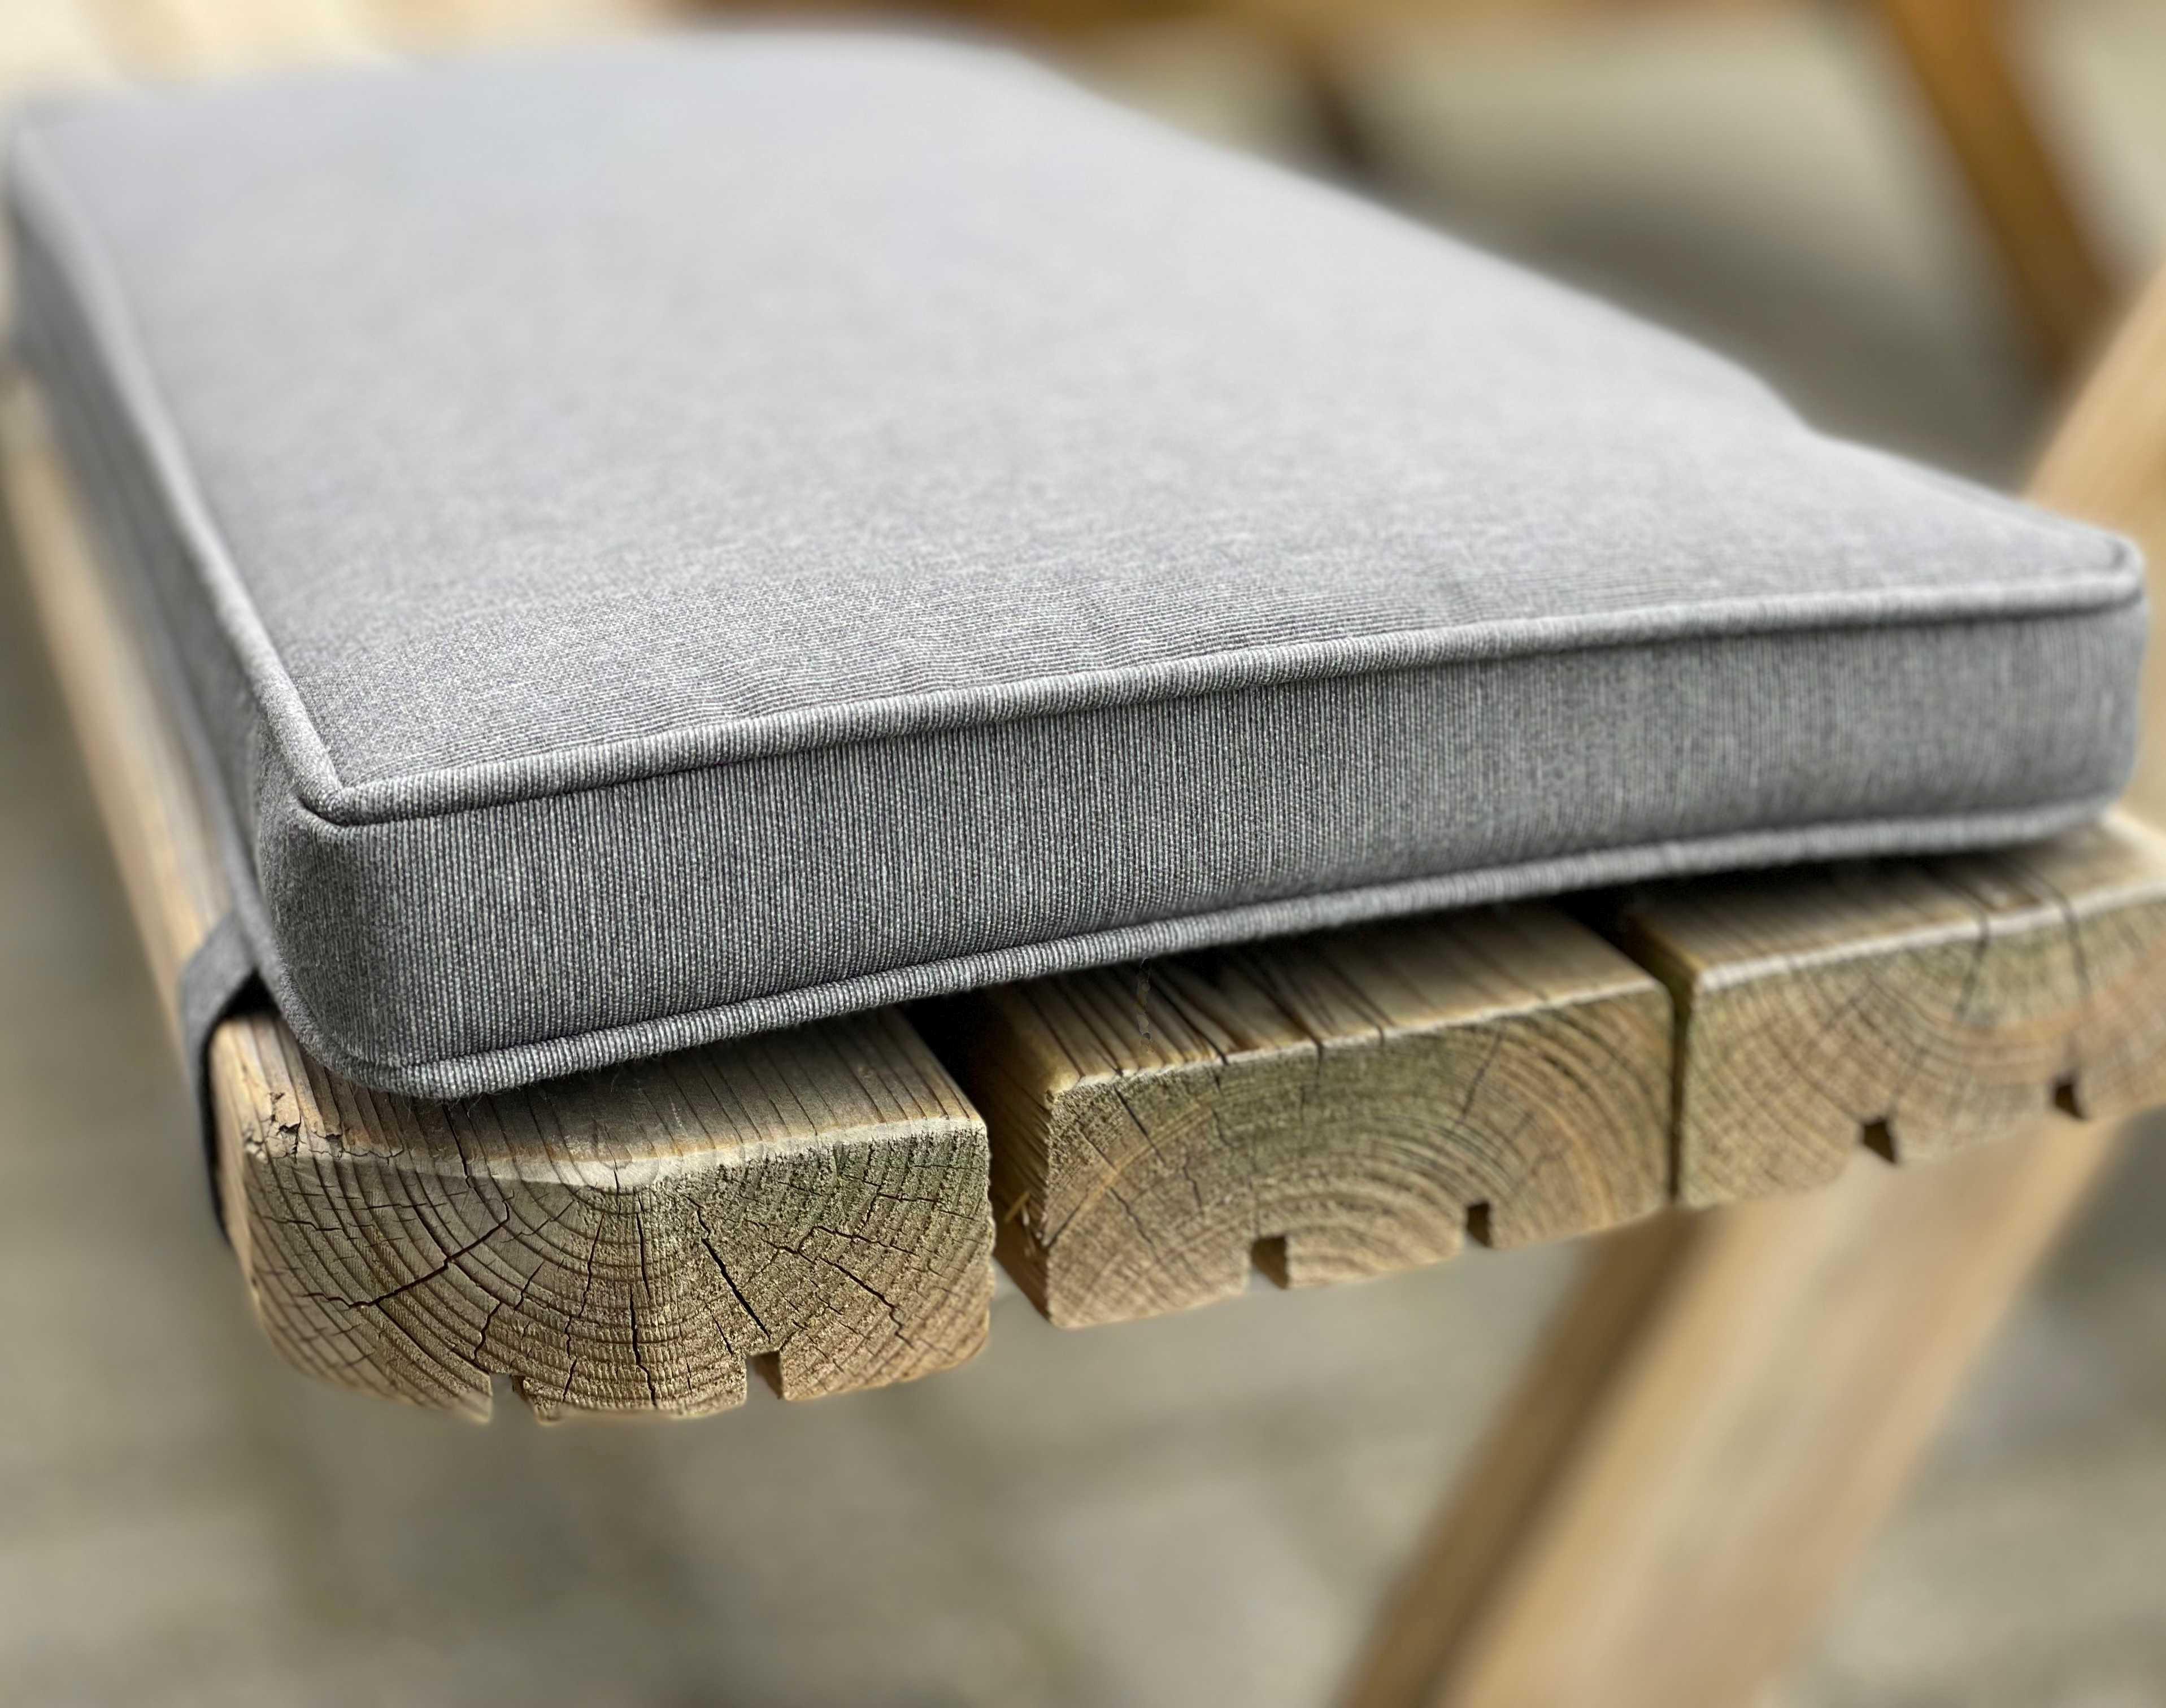 Madison tuinkussen picknicktafel, 28 x 60 cm (1-zits) - panama grey